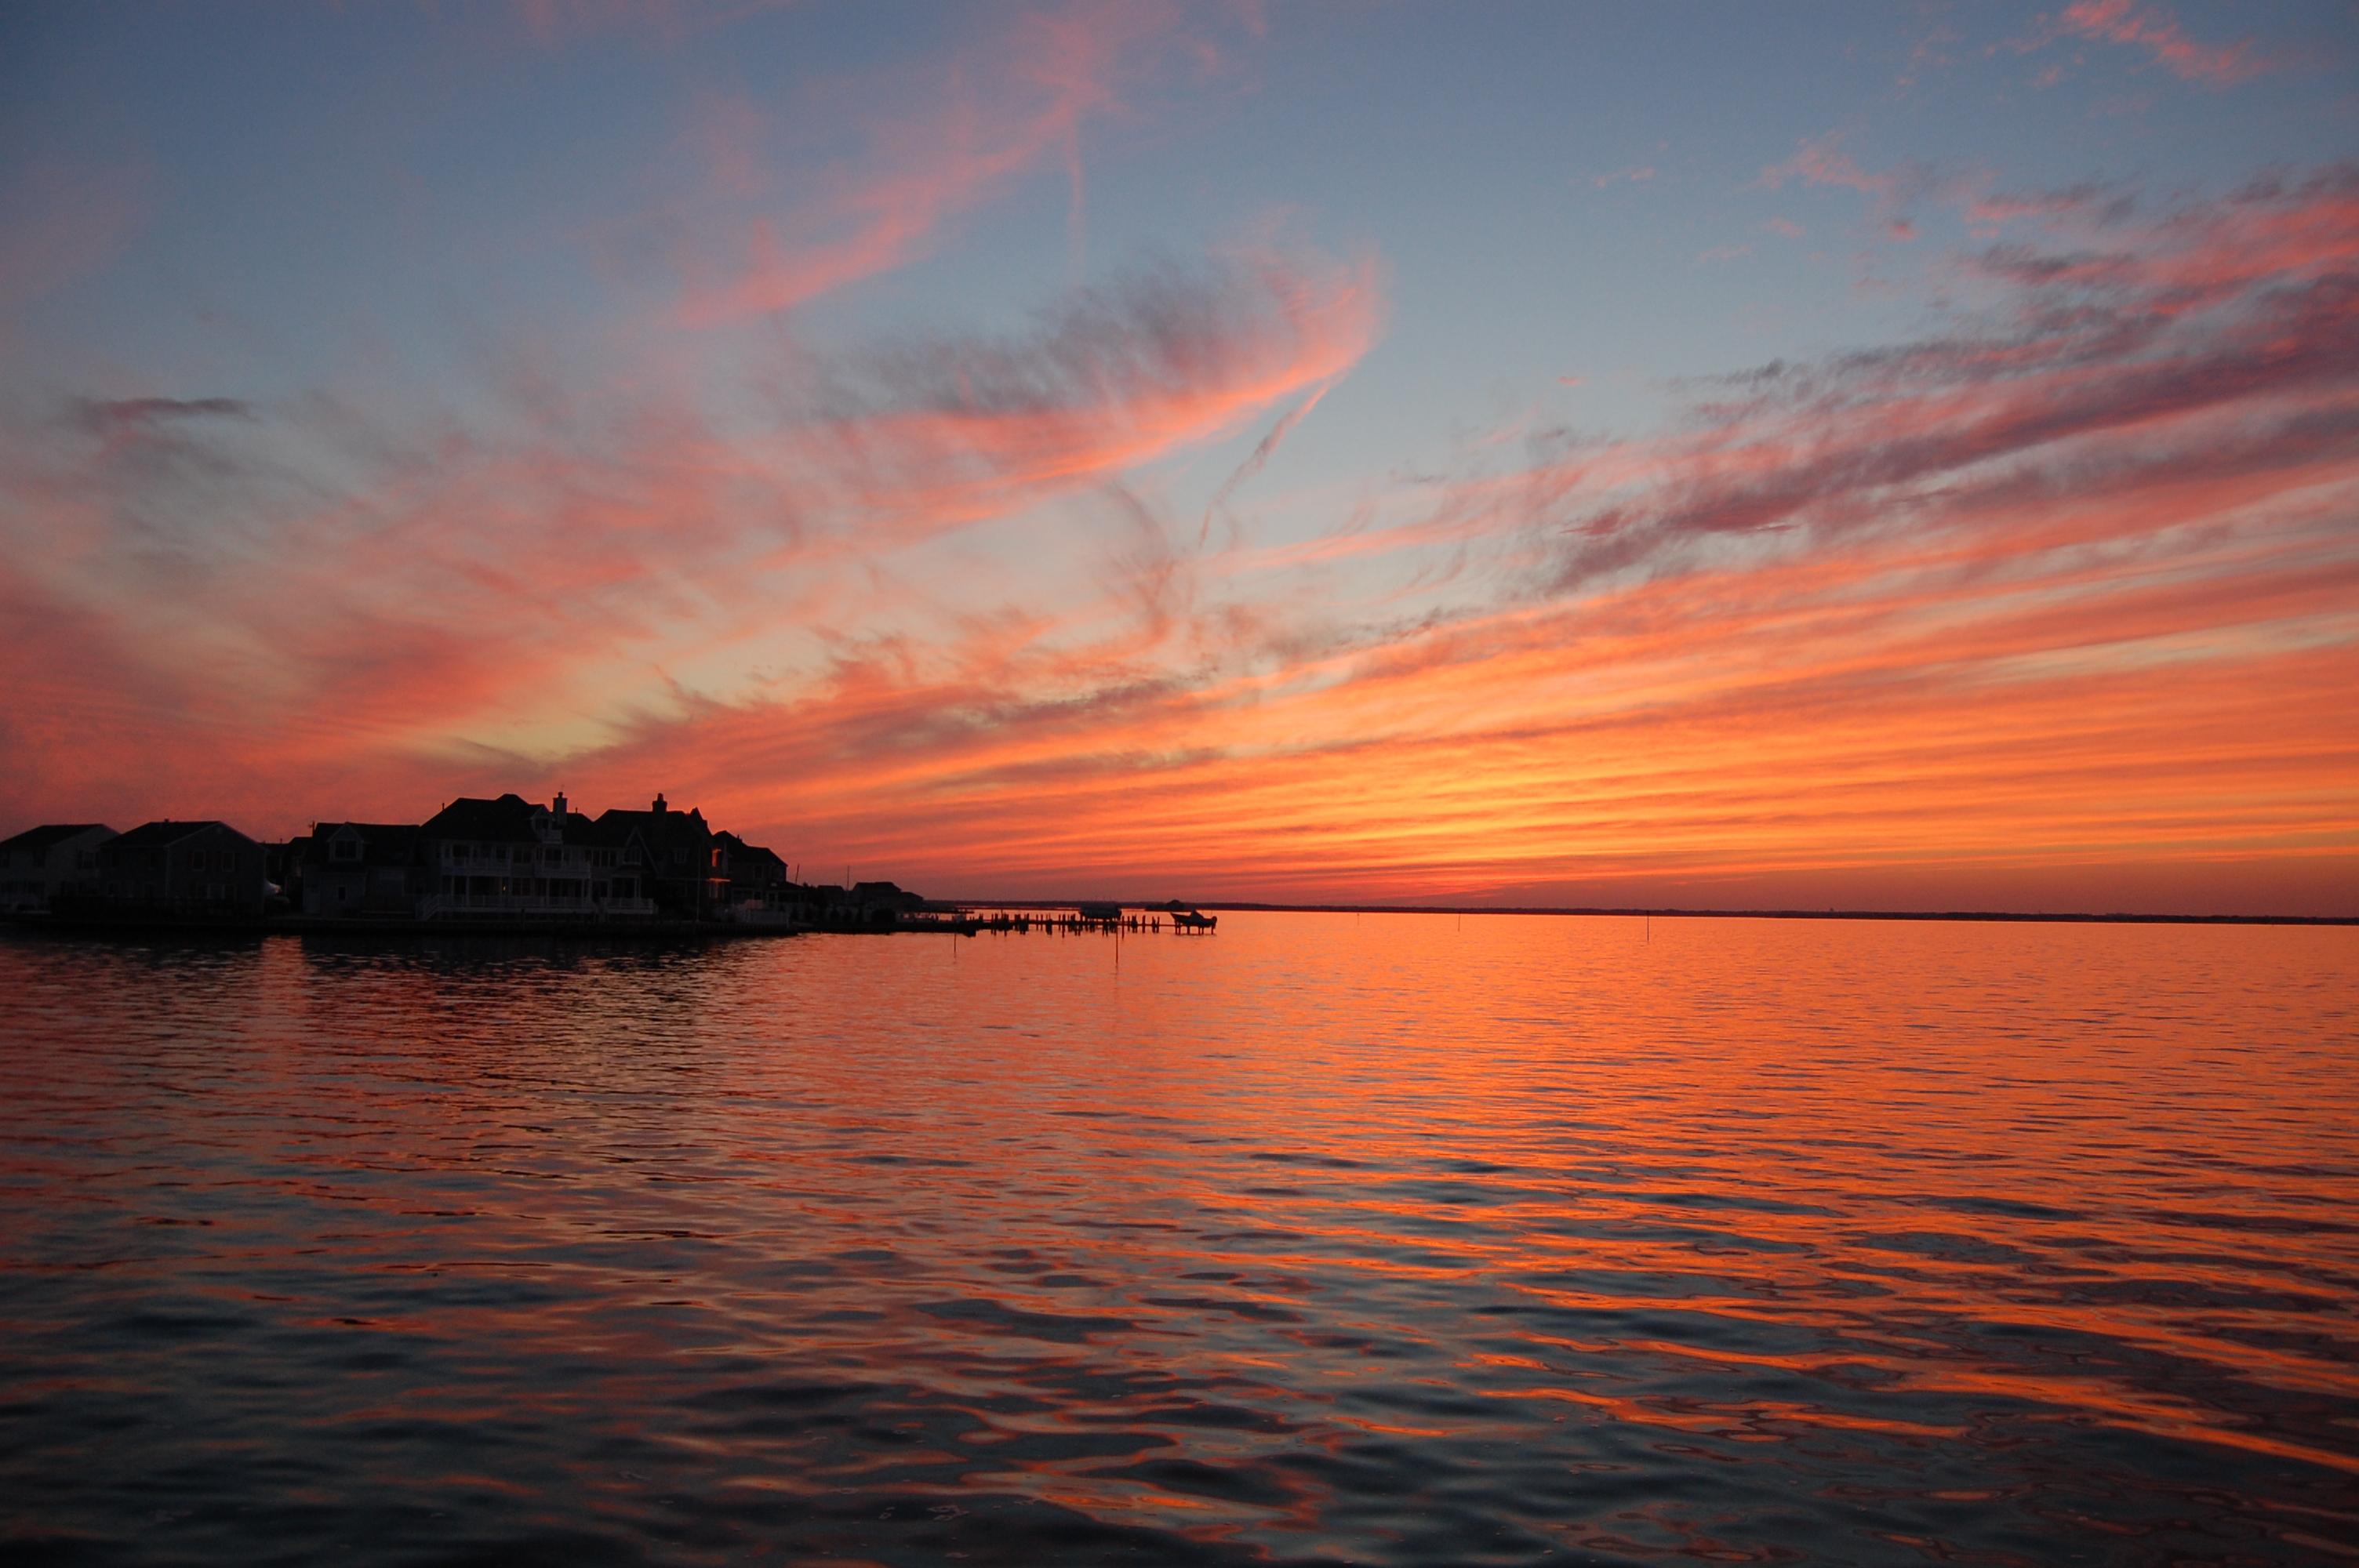 A sunset over Barnegat Bay in Brick, N.J.'s Normandy Beach section. (Photo: Daniel Nee)